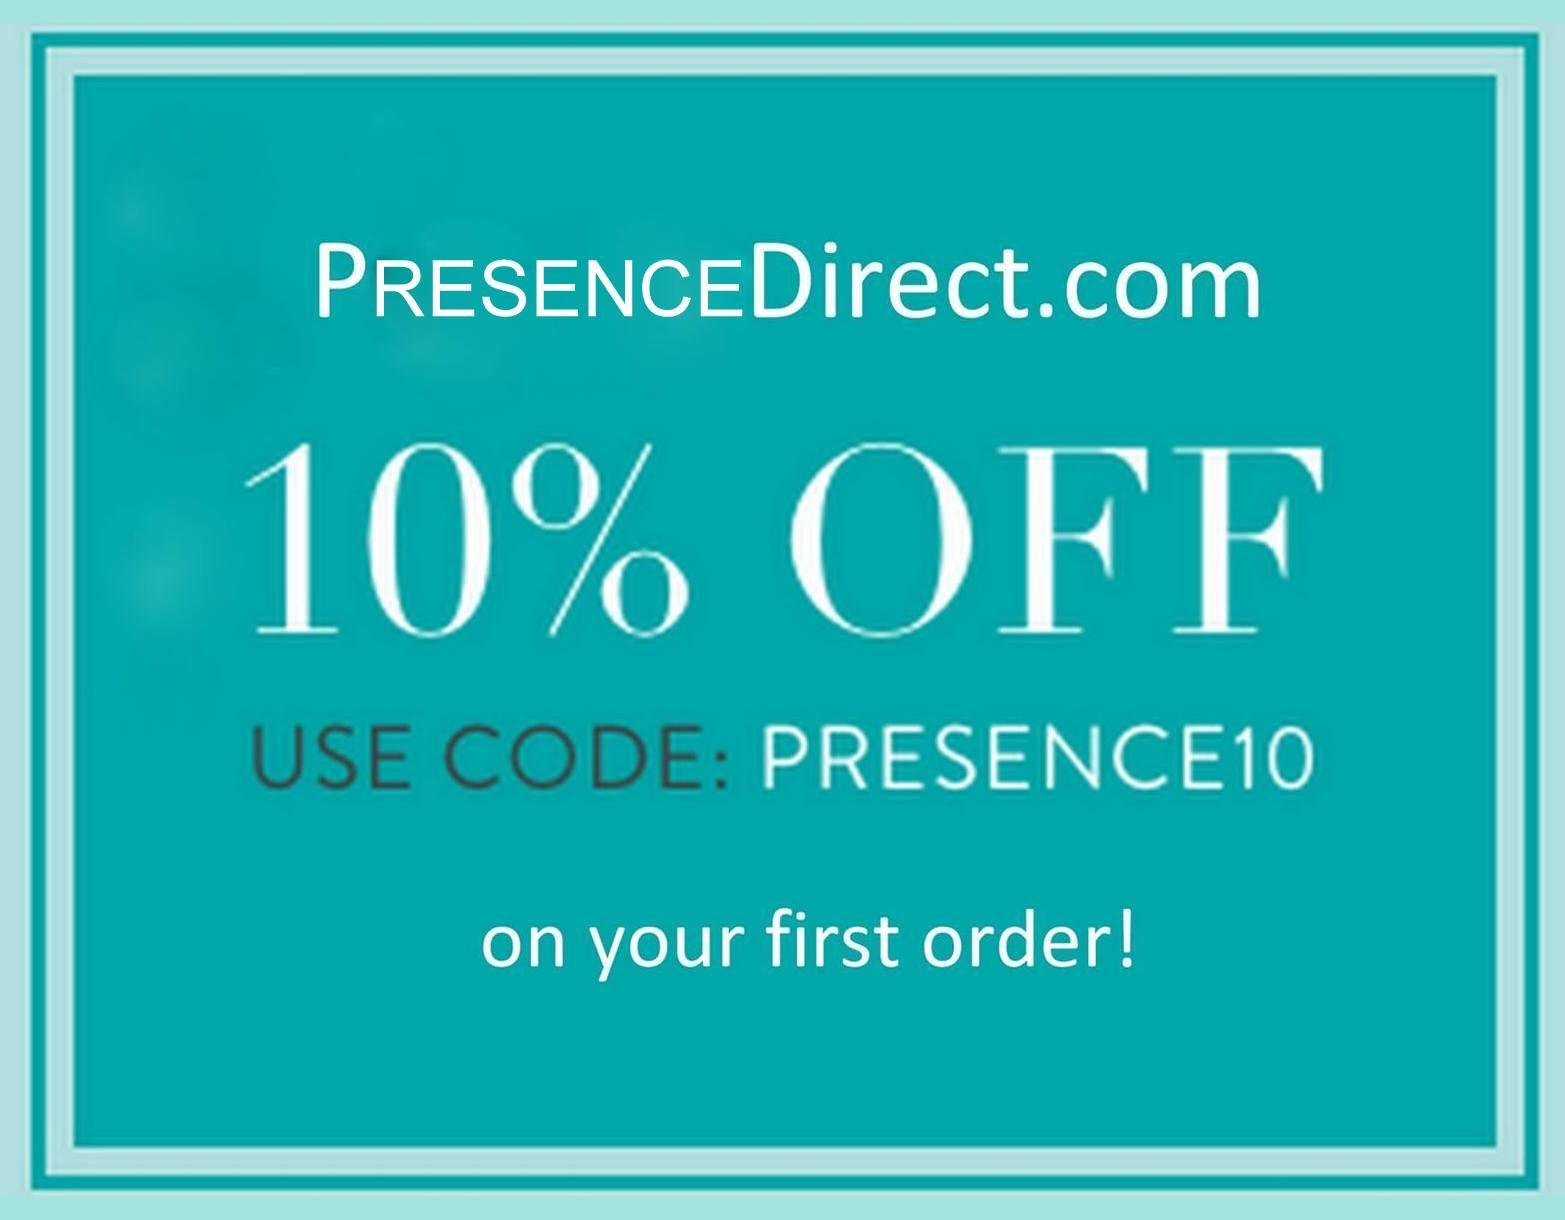 Presence website use code